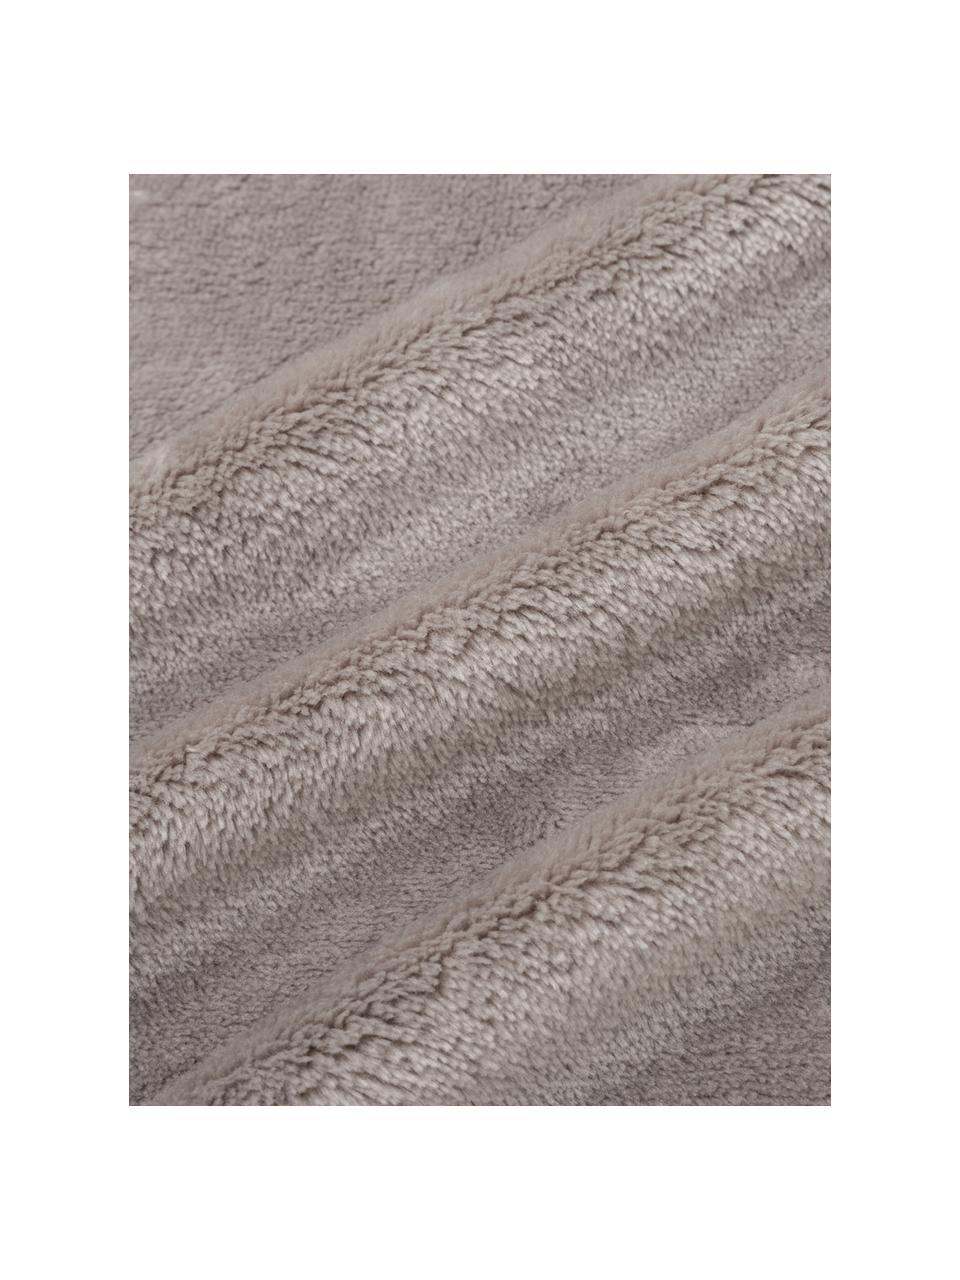 Kuscheldecke Bomla in Taupe mit Pompoms, 100% Polyester, Taupe, 130 x 170 cm